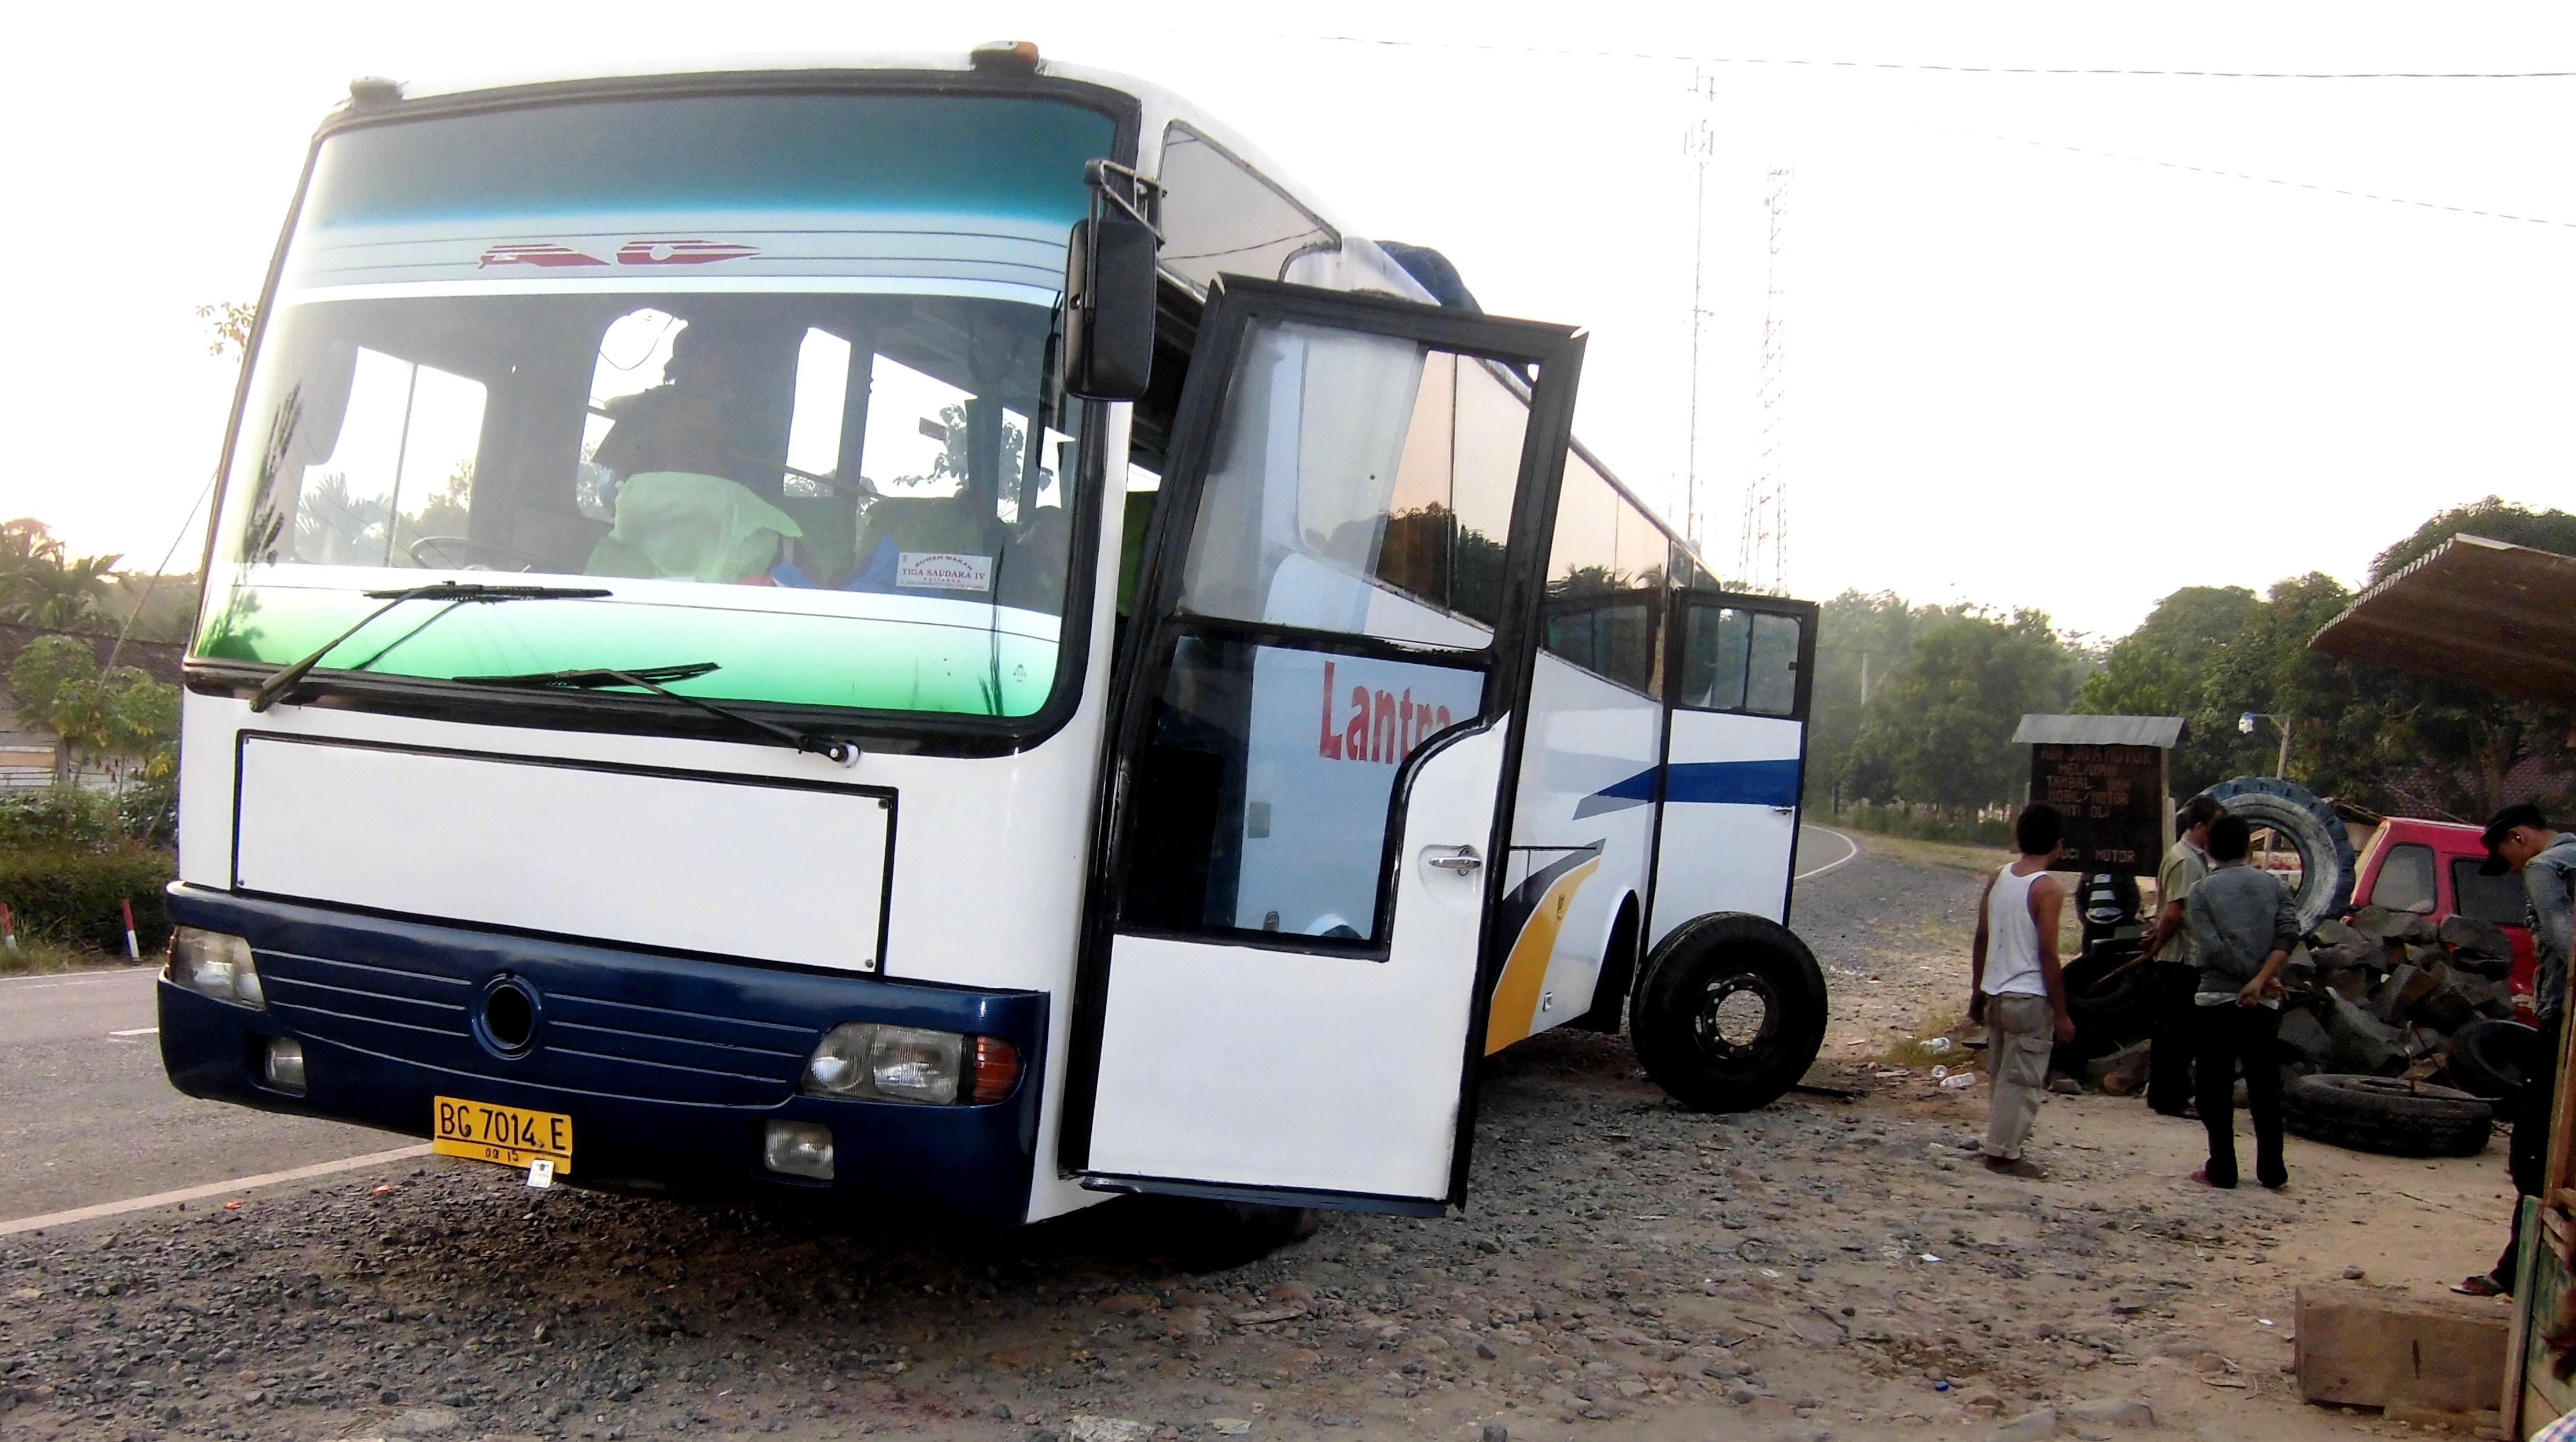 Free stock photo of bus, public transport, public transportation